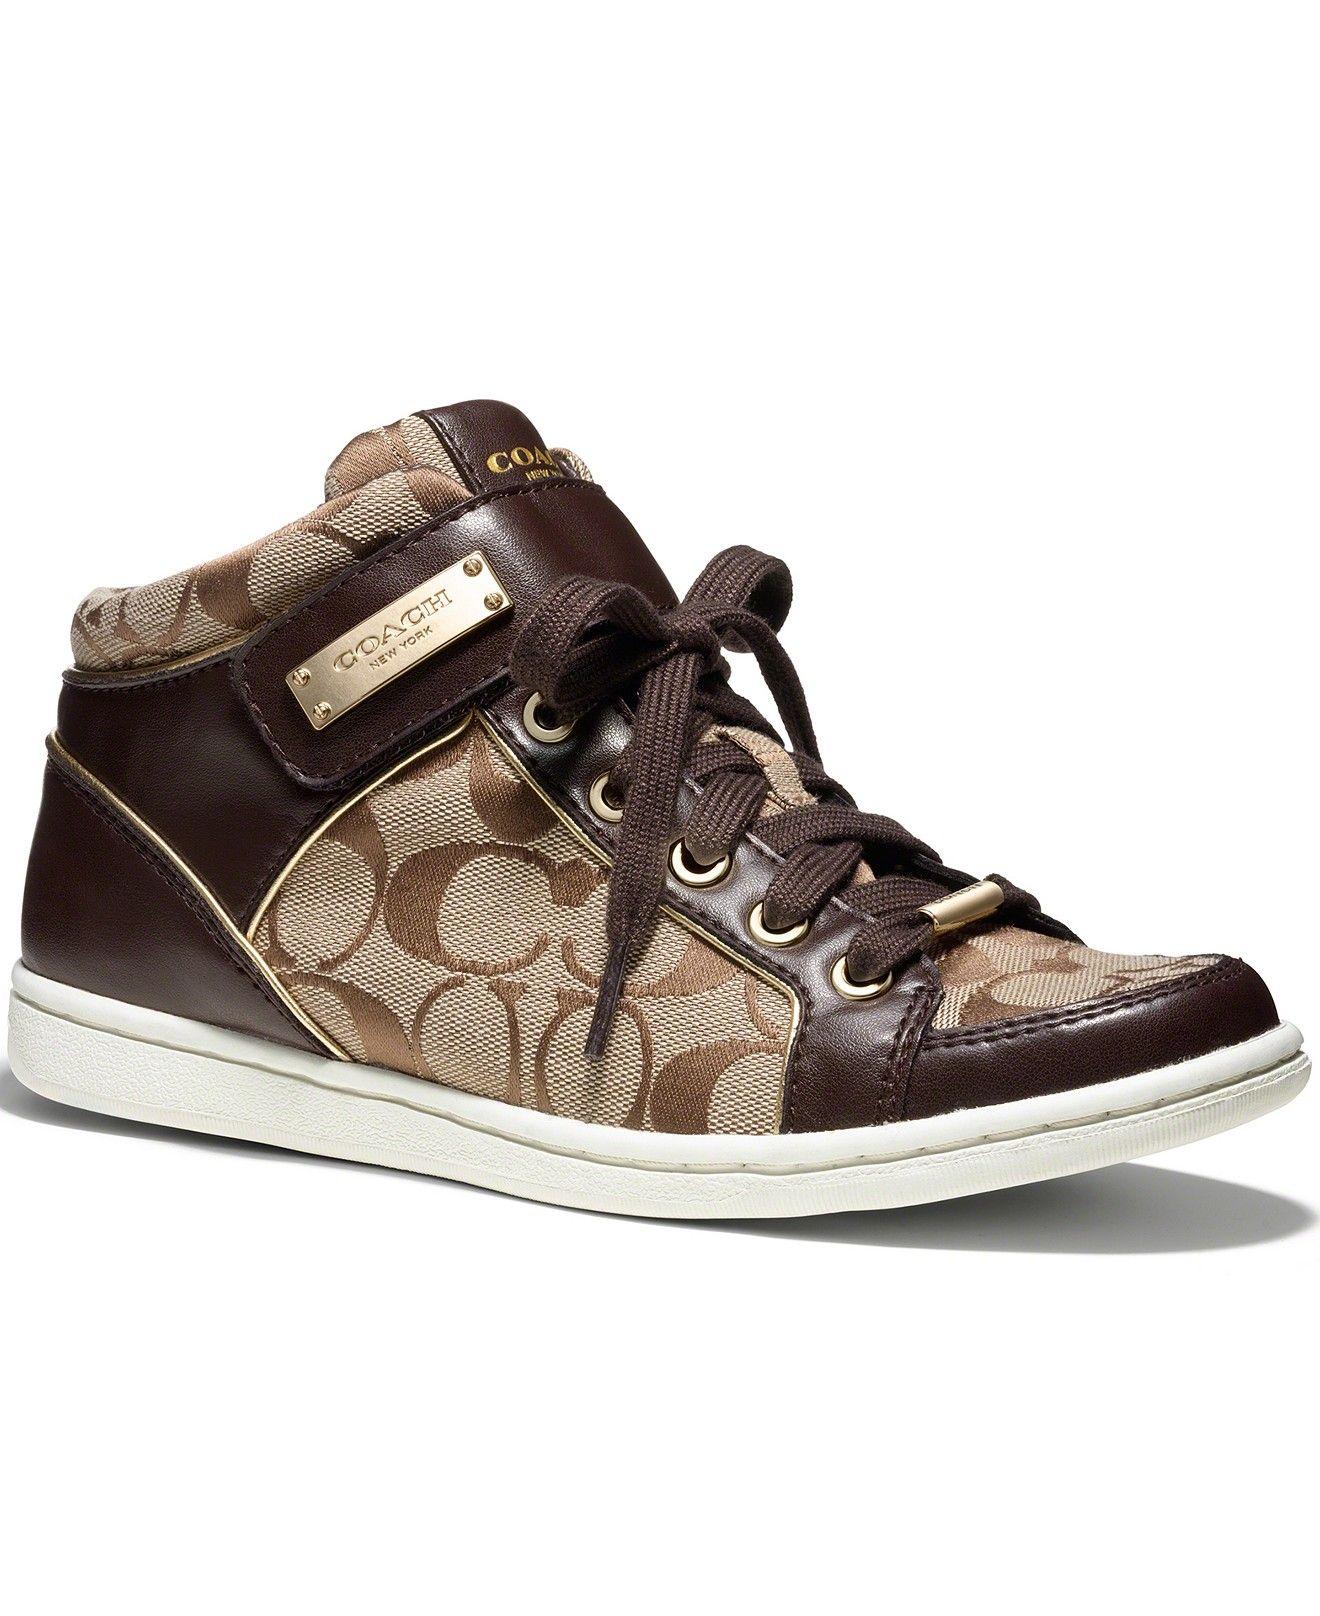 COACH Zany Logo High Top Sneakers Sneakers Shoes Macy s